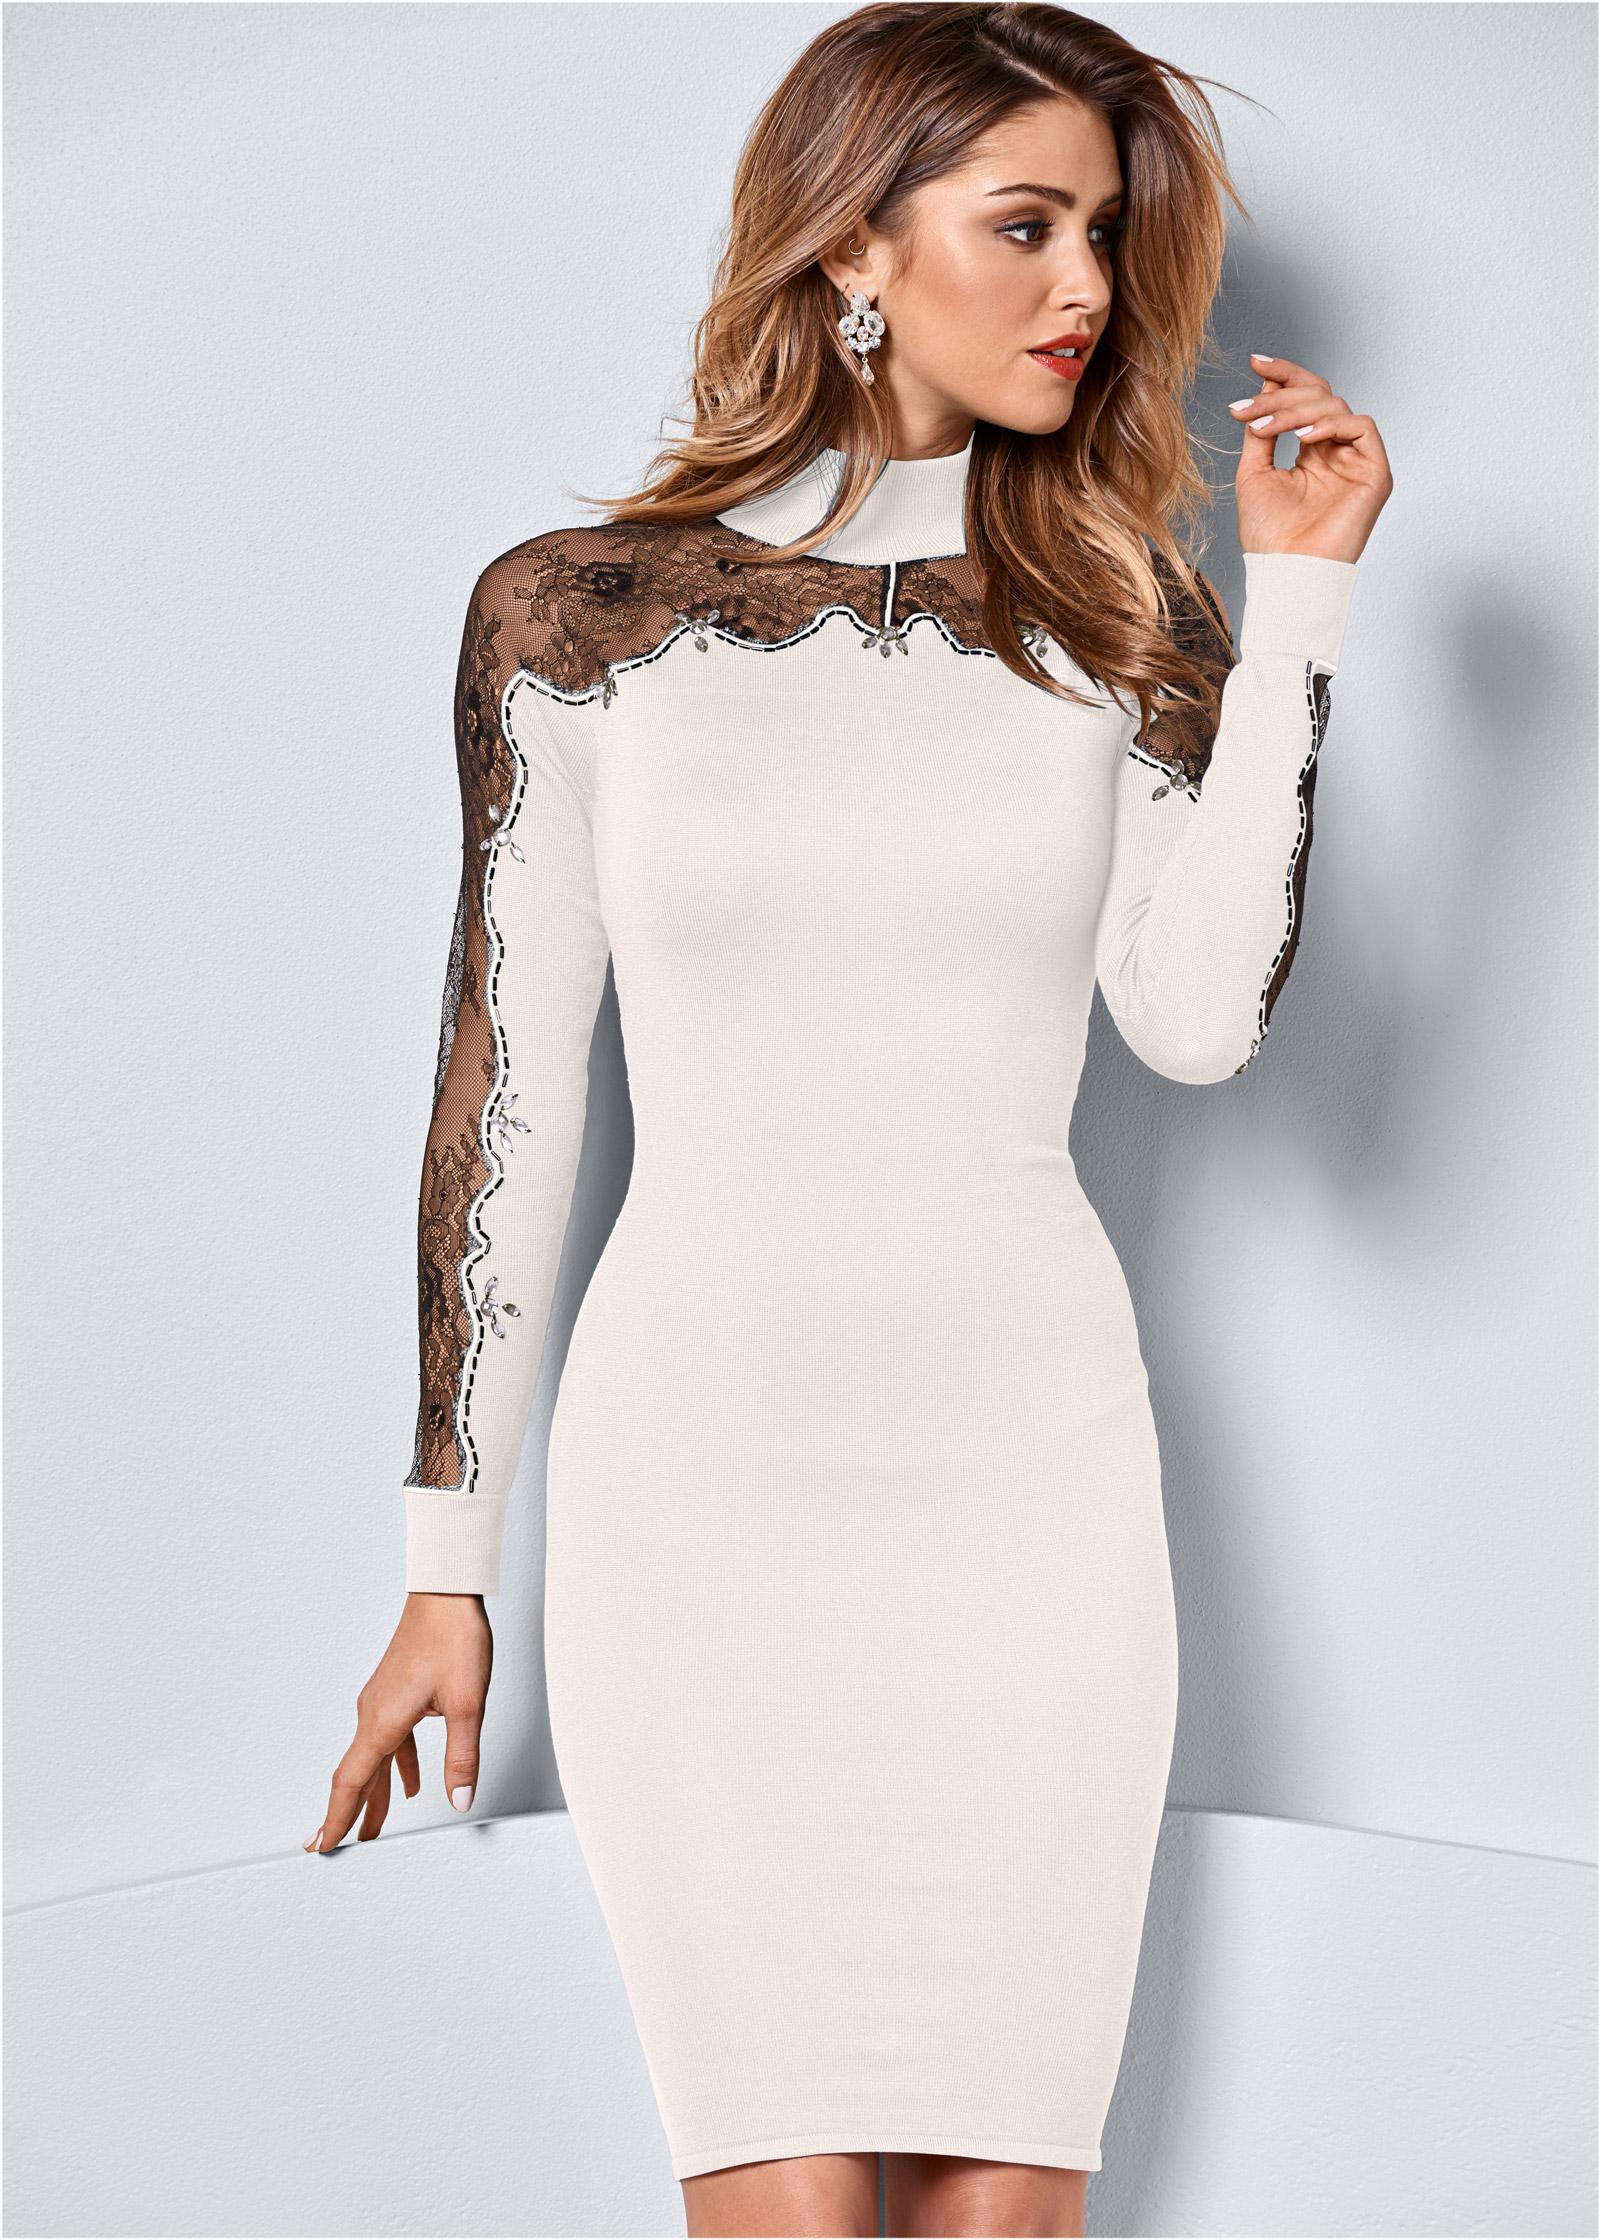 Vintage metallic lace halter dress consider